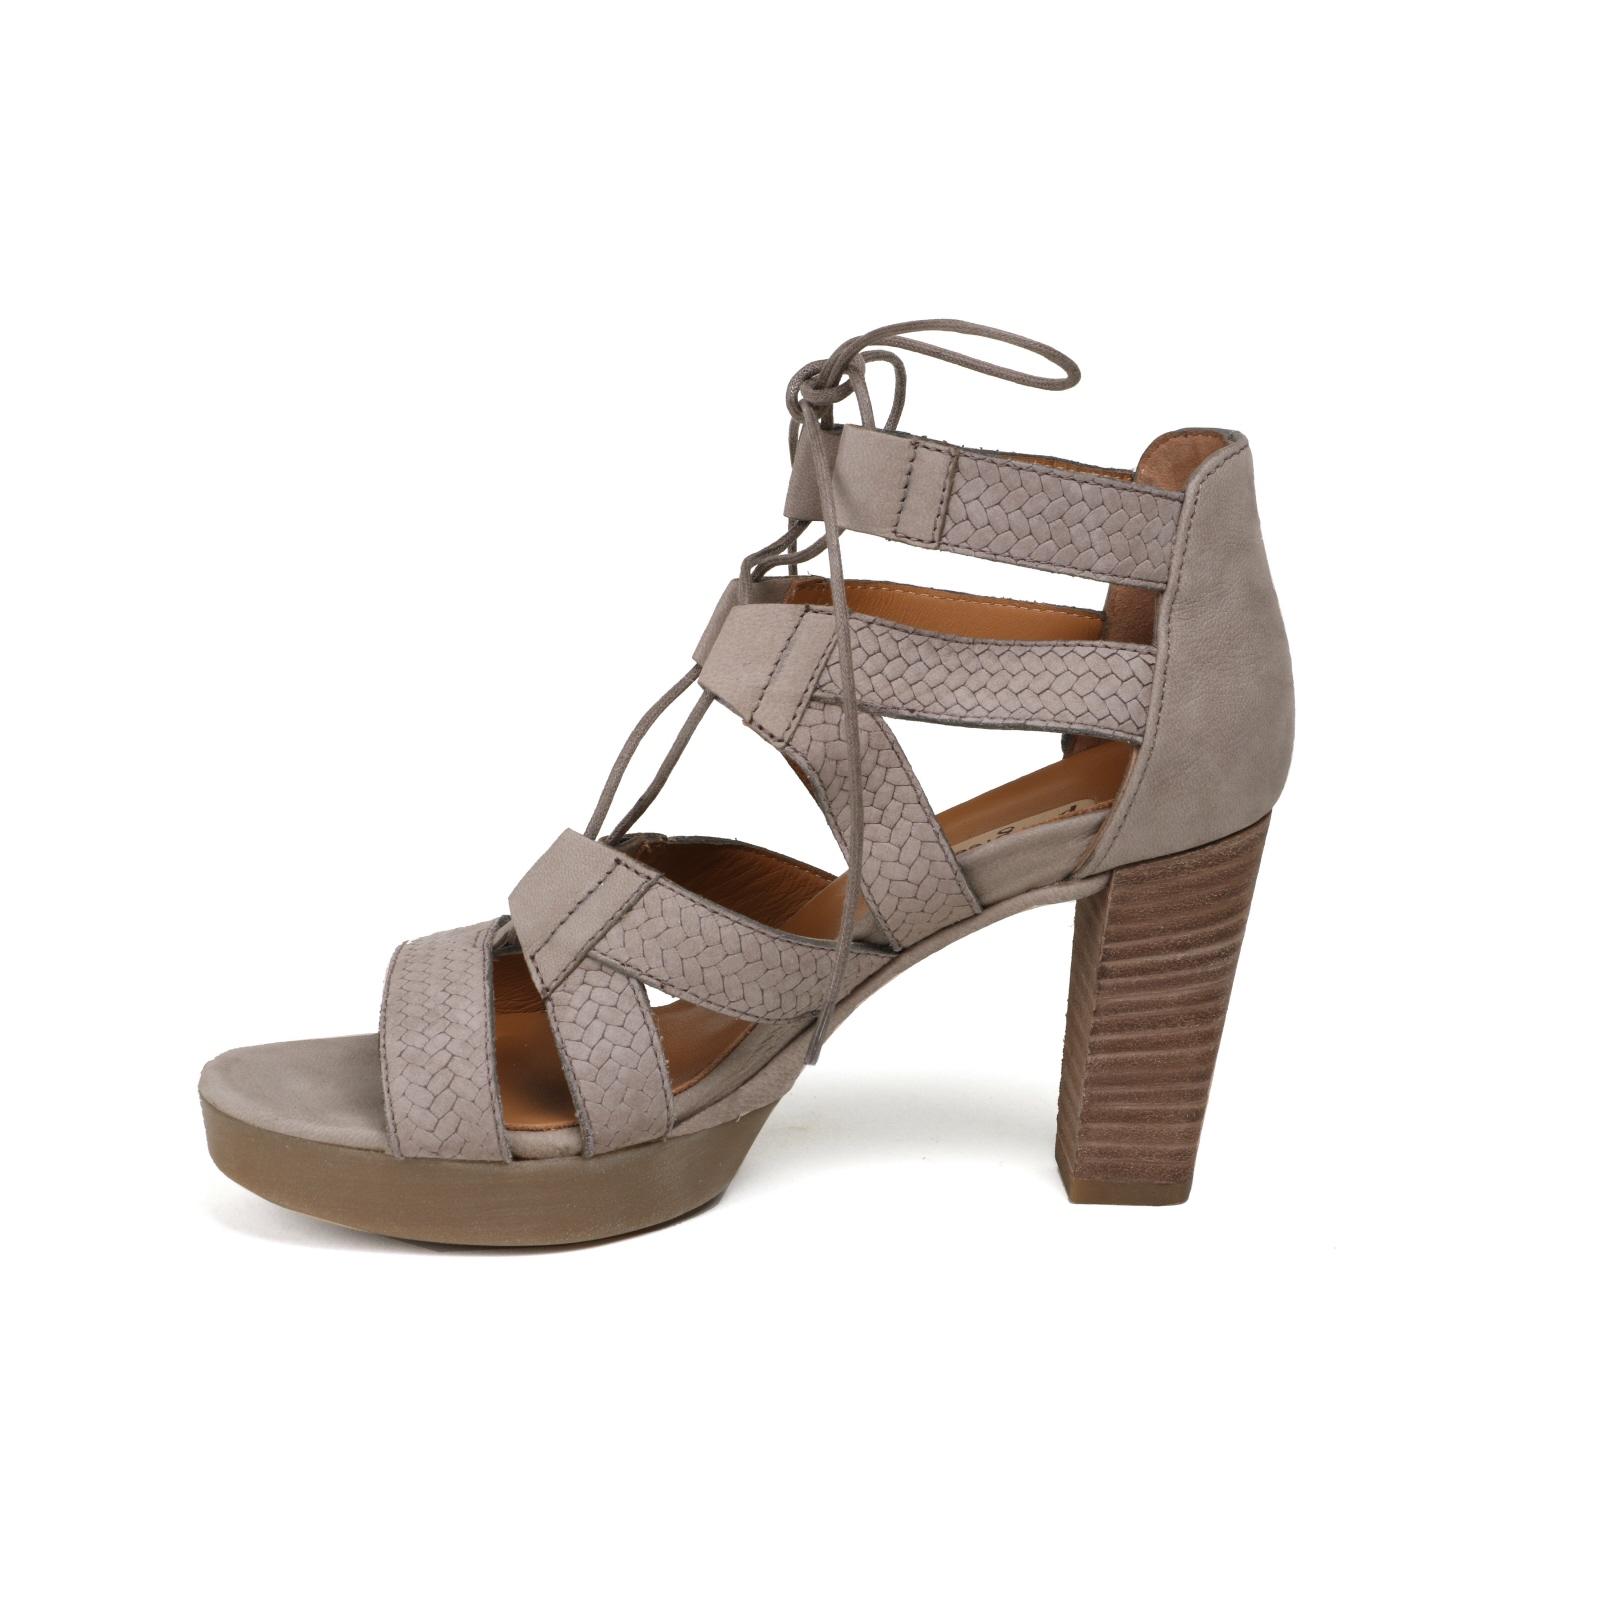 Damen 5 Green Sandalette Schlamm Gr Farben Nubukleder Paul Trendig 38 Neu OPkZ80NnwX